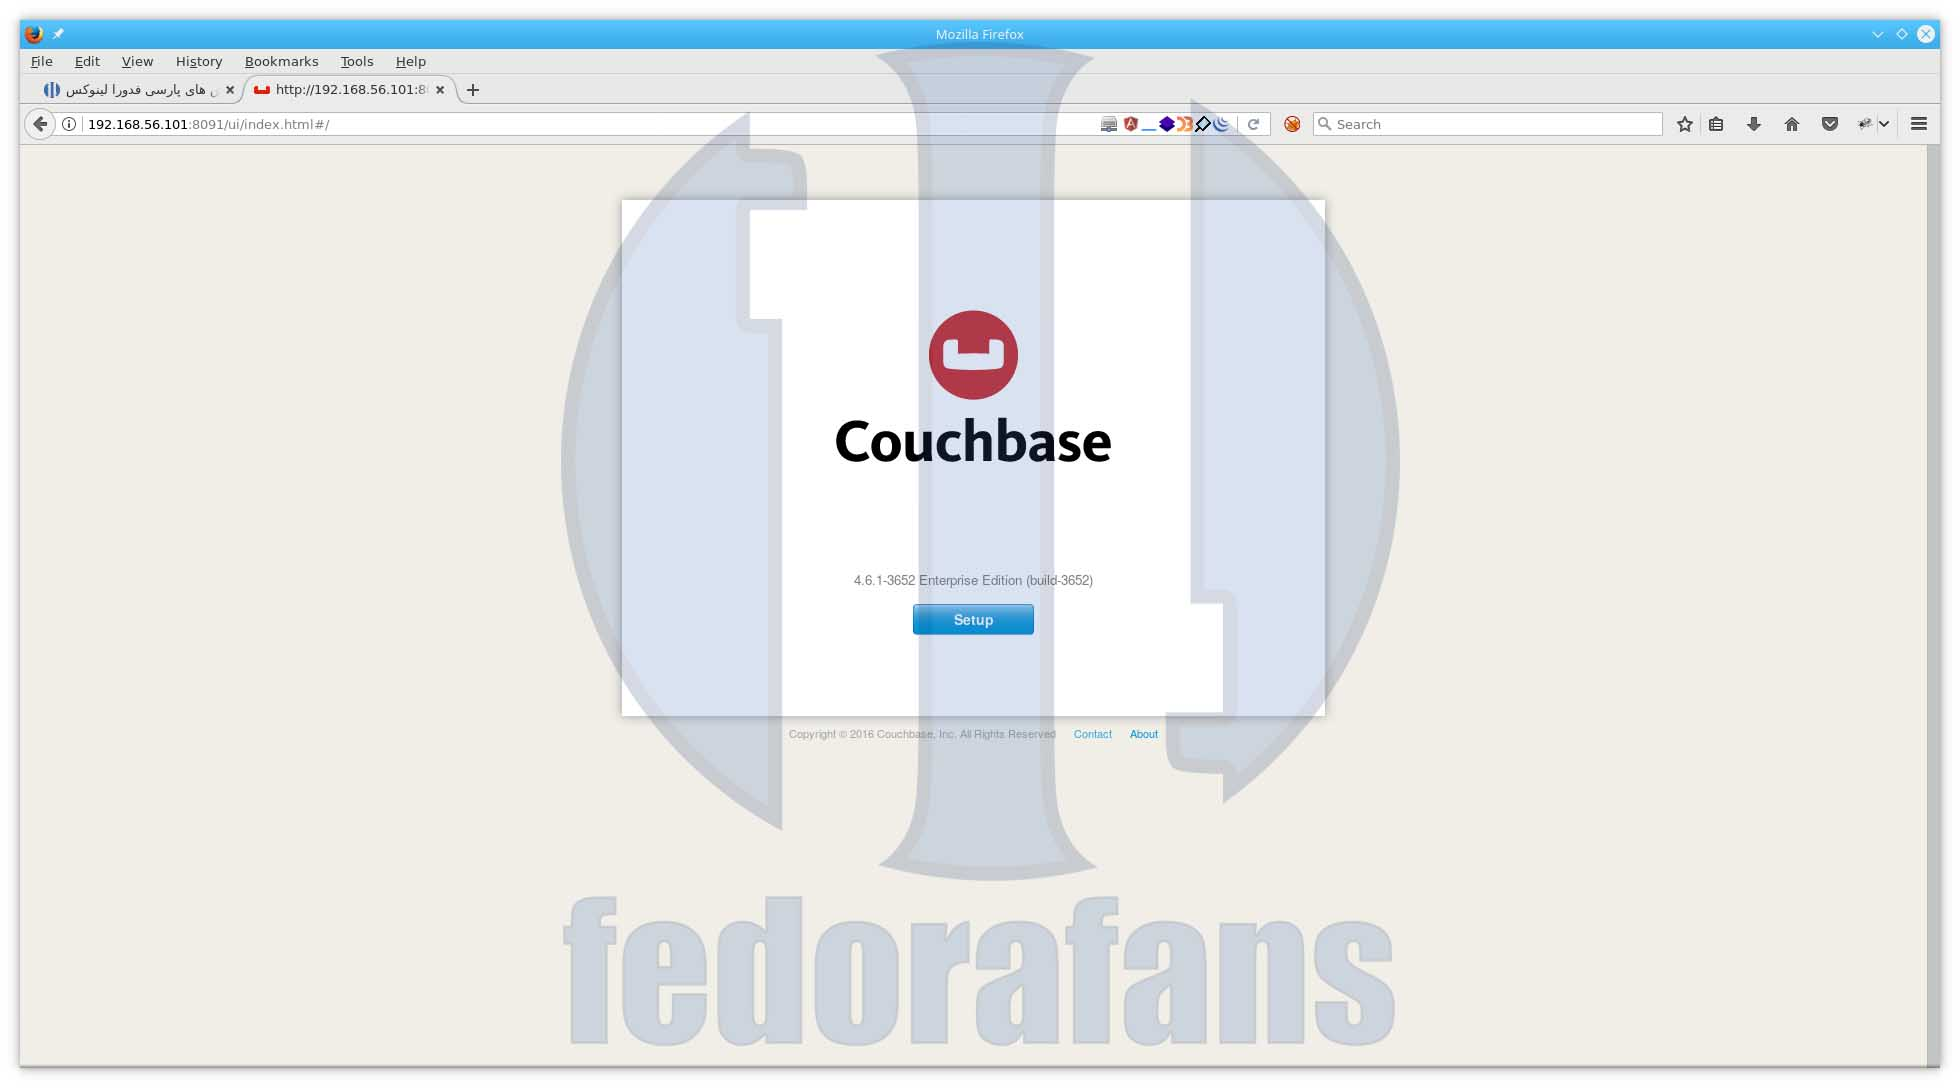 3-couchbase-server-fedorafans.com